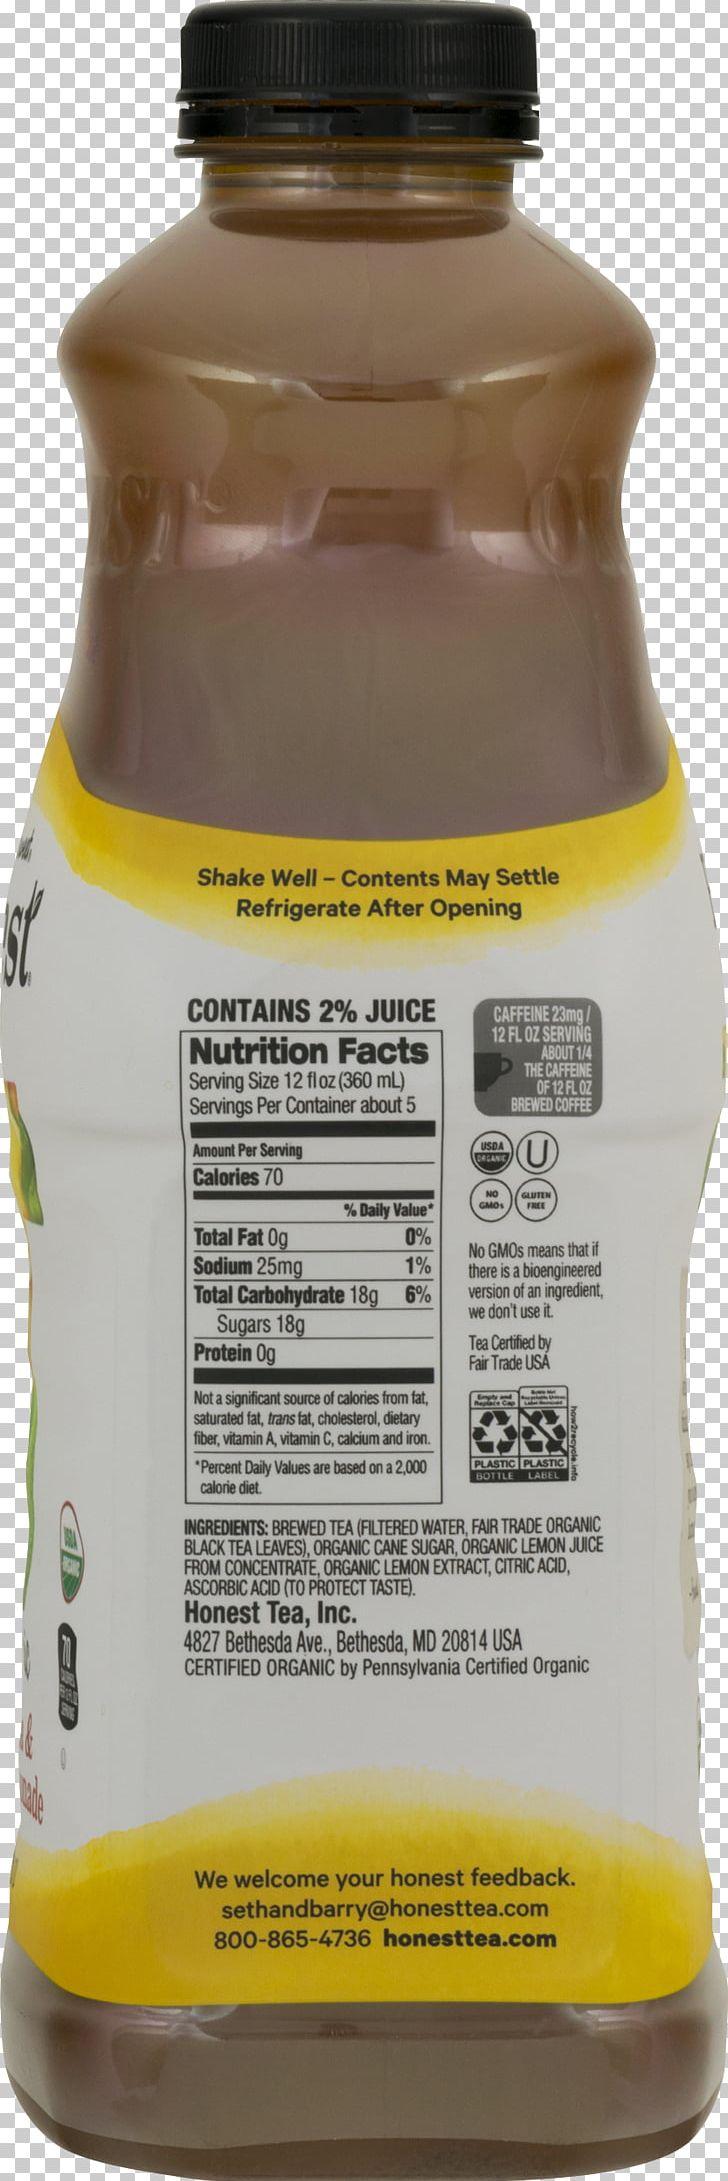 Lipton Black Tea Nutrition Facts Label